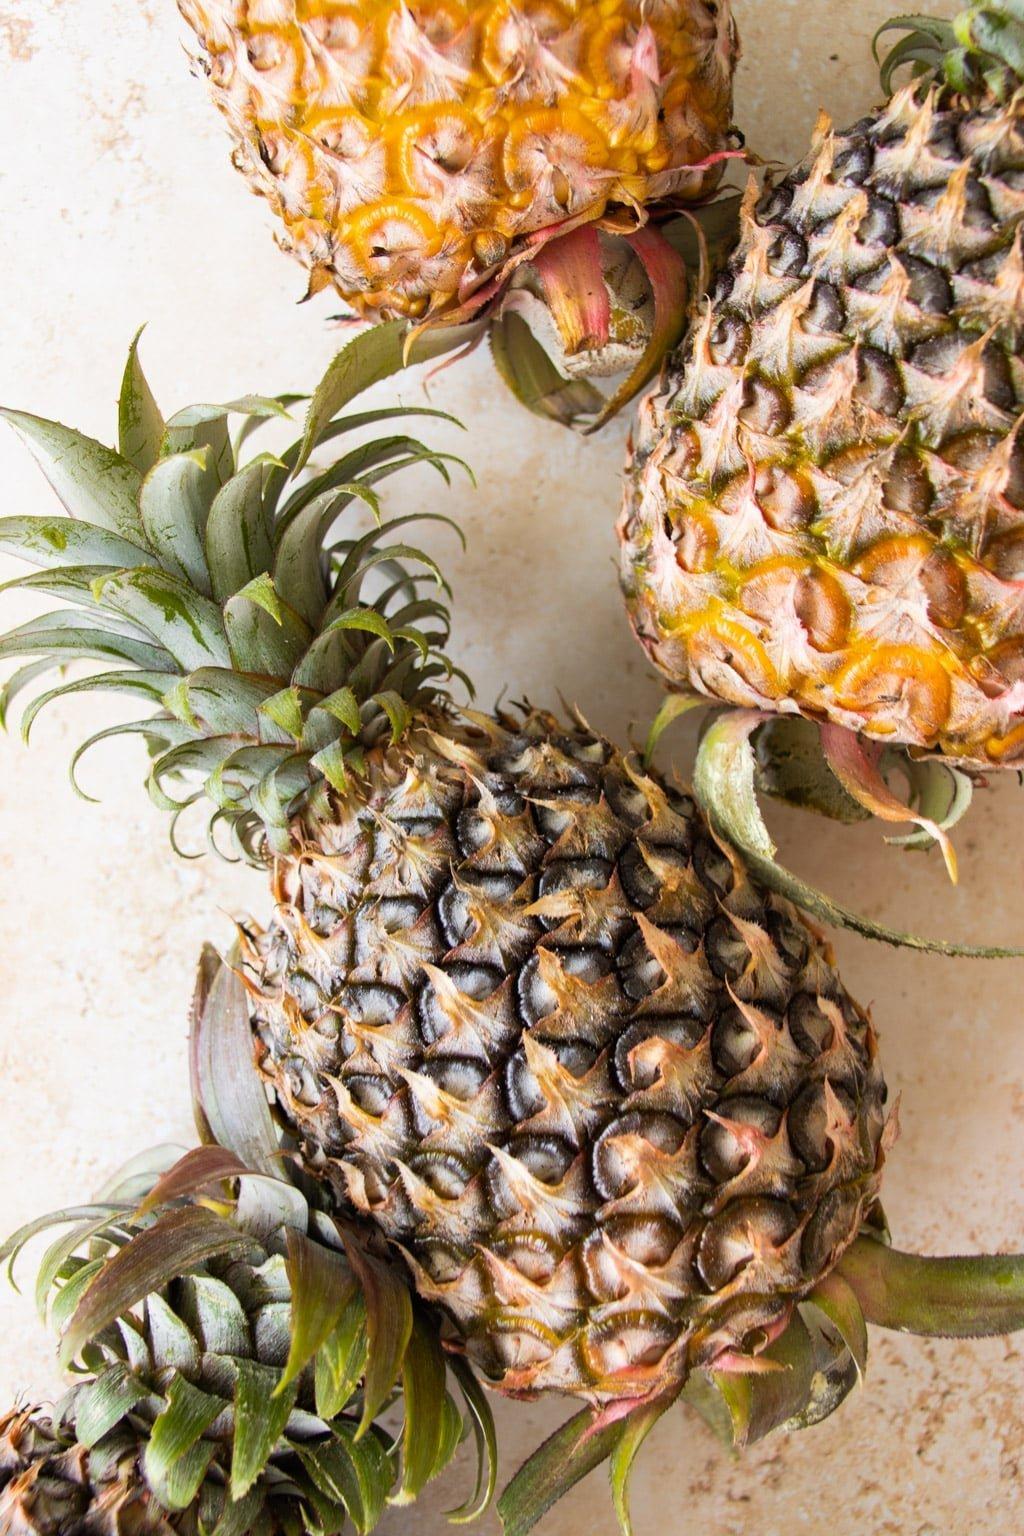 Whole, uncut pineapples